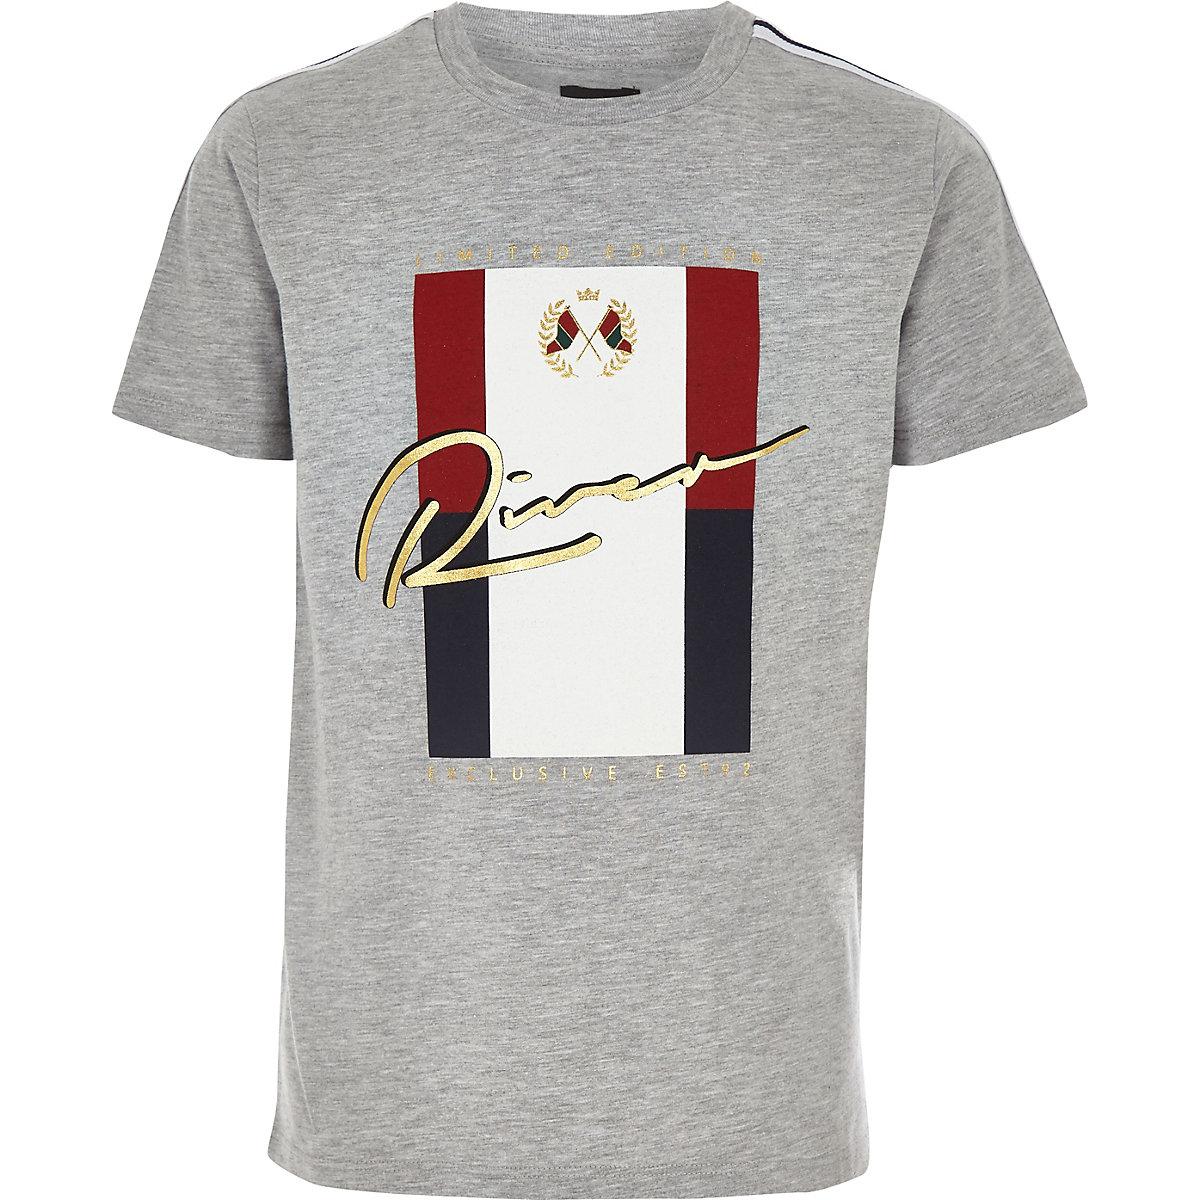 Boys grey 'River' foil print T-shirt